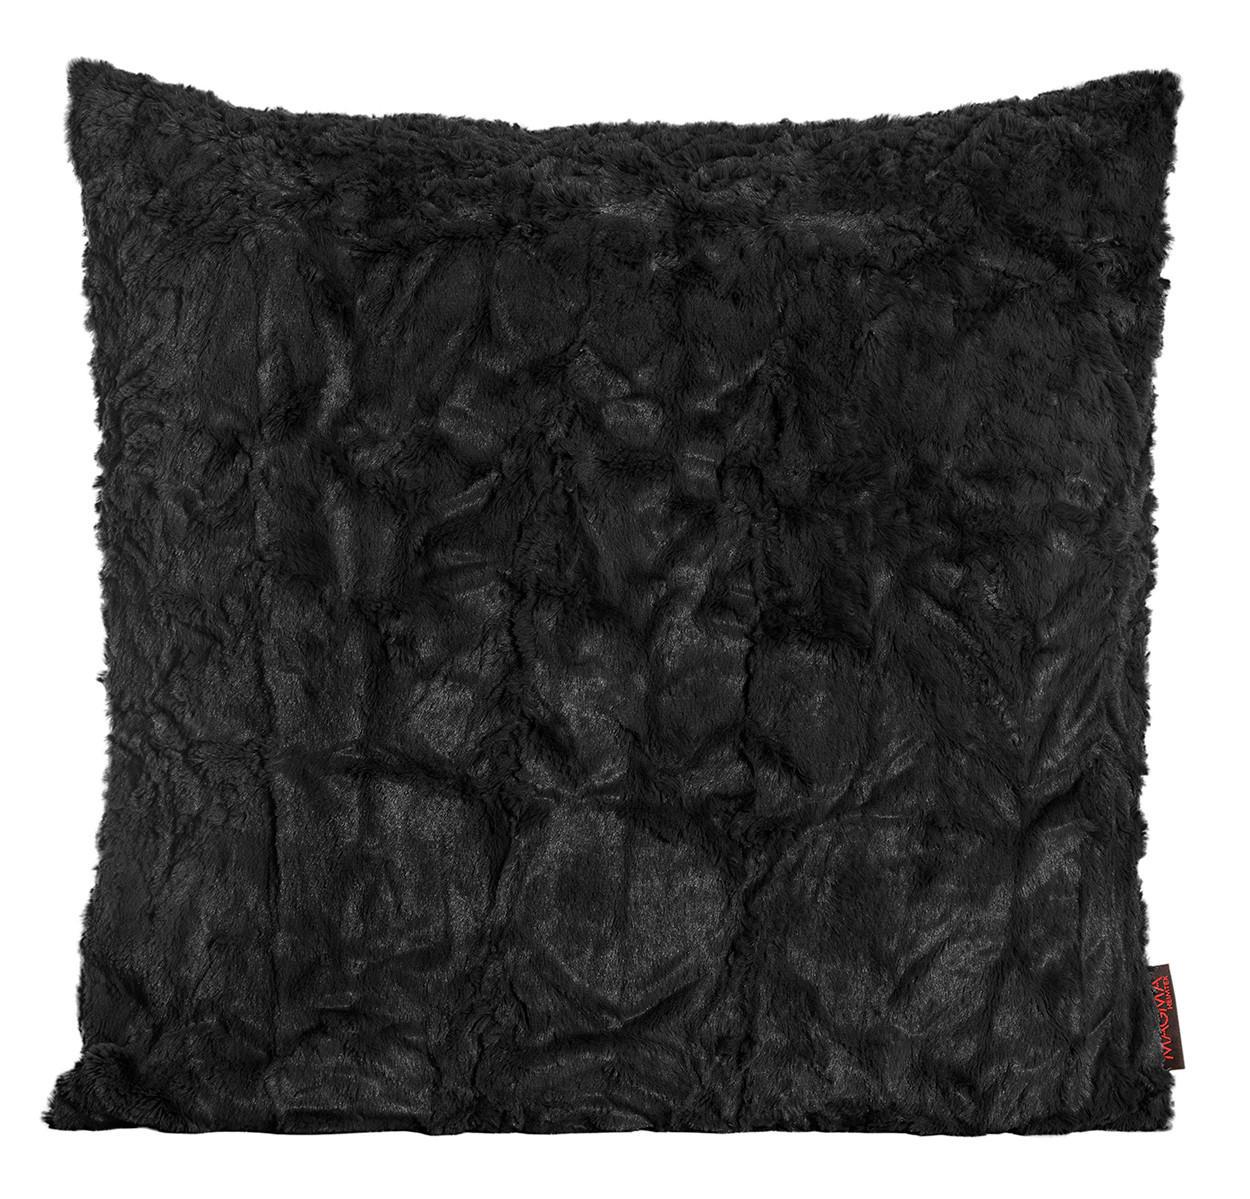 ZIERKISSEN 50/50 cm - Schwarz, Basics, Textil (50/50cm) - NOVEL